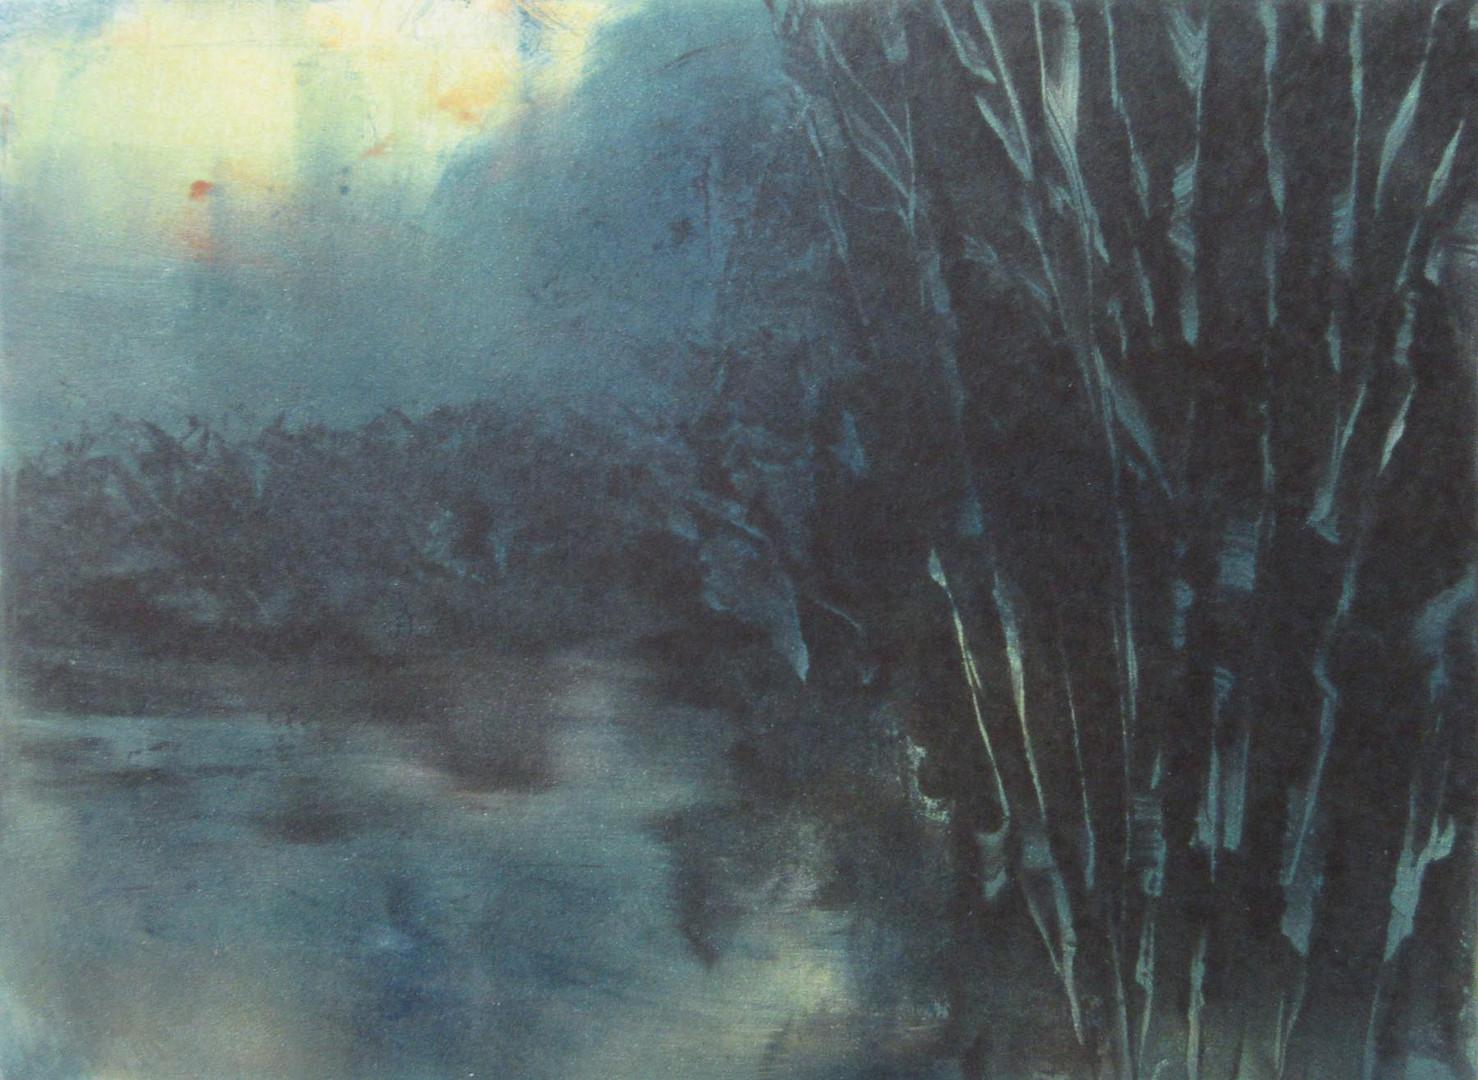 Journey by Twilight 3, Monotype, 8 x 10_